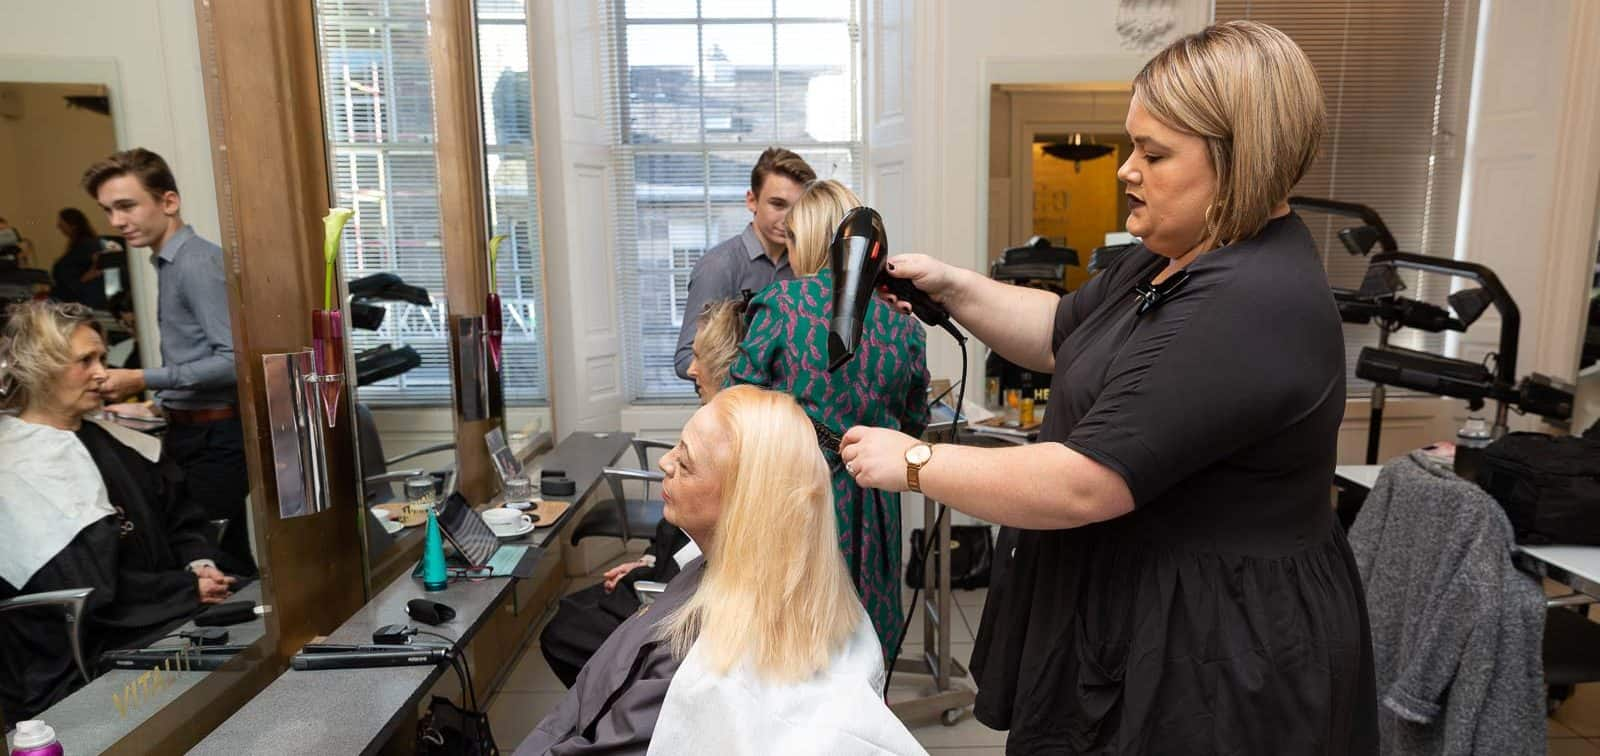 Stafford Street Salon Manager, Elle Craik